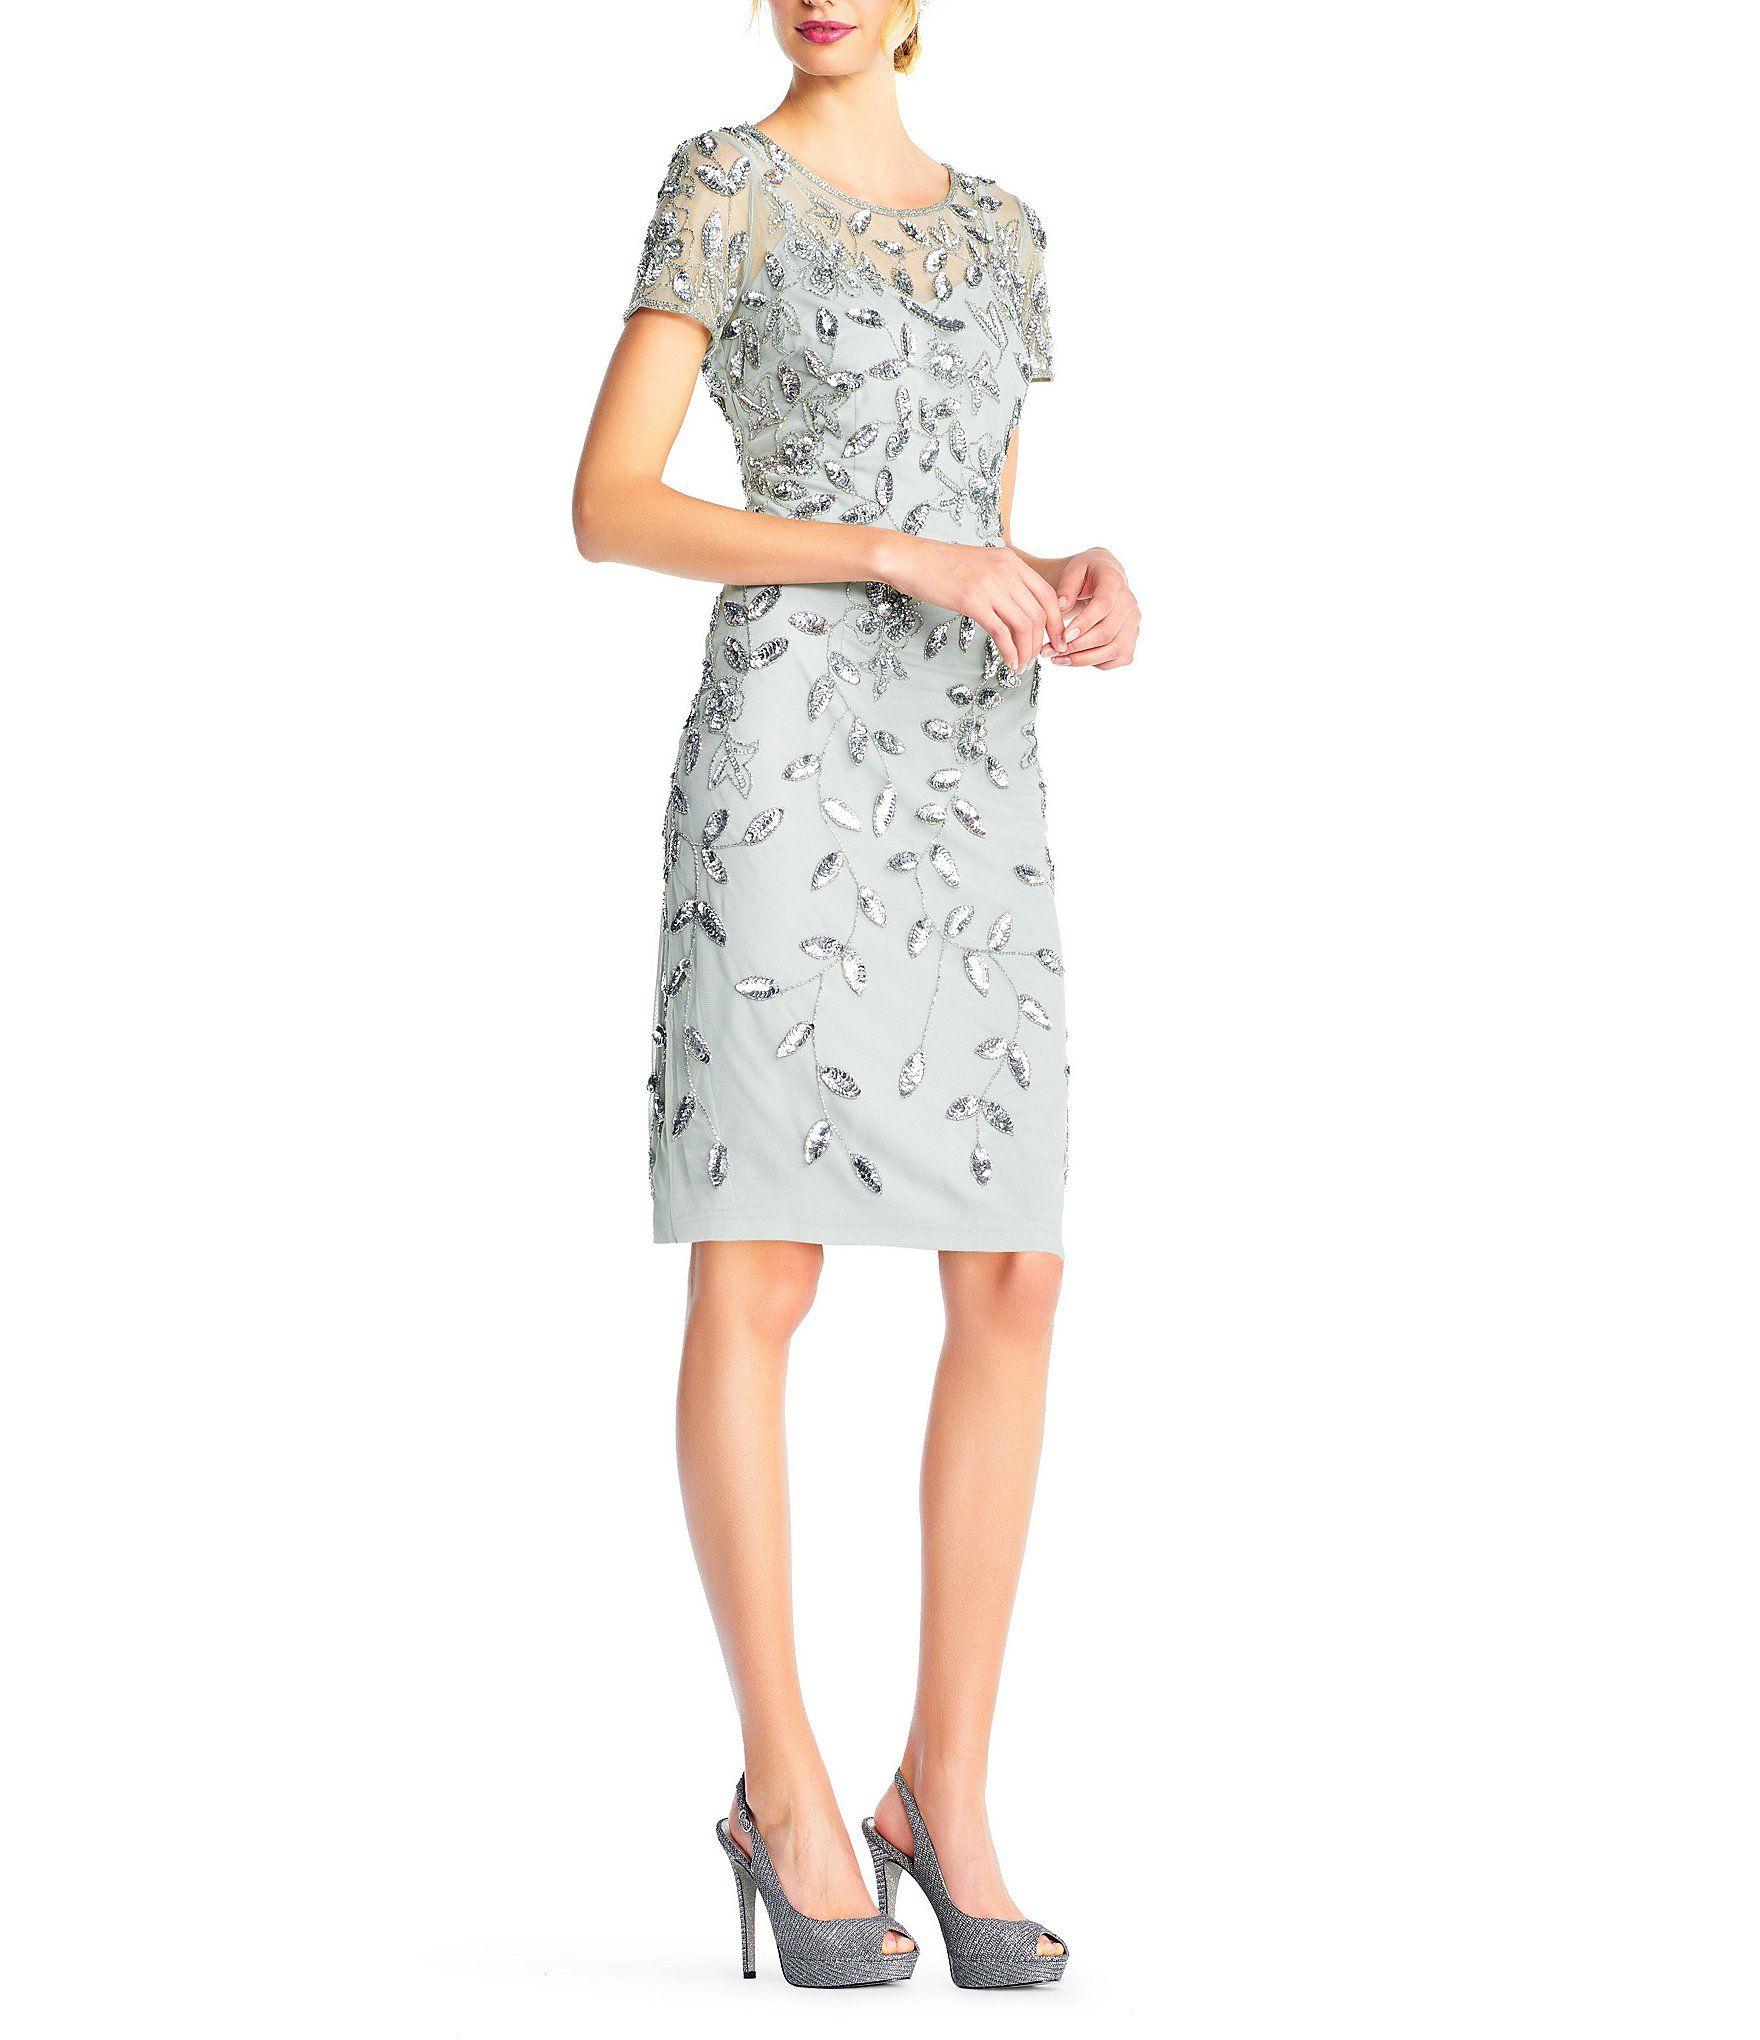 Adrianna Papell Sequin Floral Beaded Short Dress Dillards Metallic Cocktail Dresses Short Dresses Mother Of The Bride Dresses